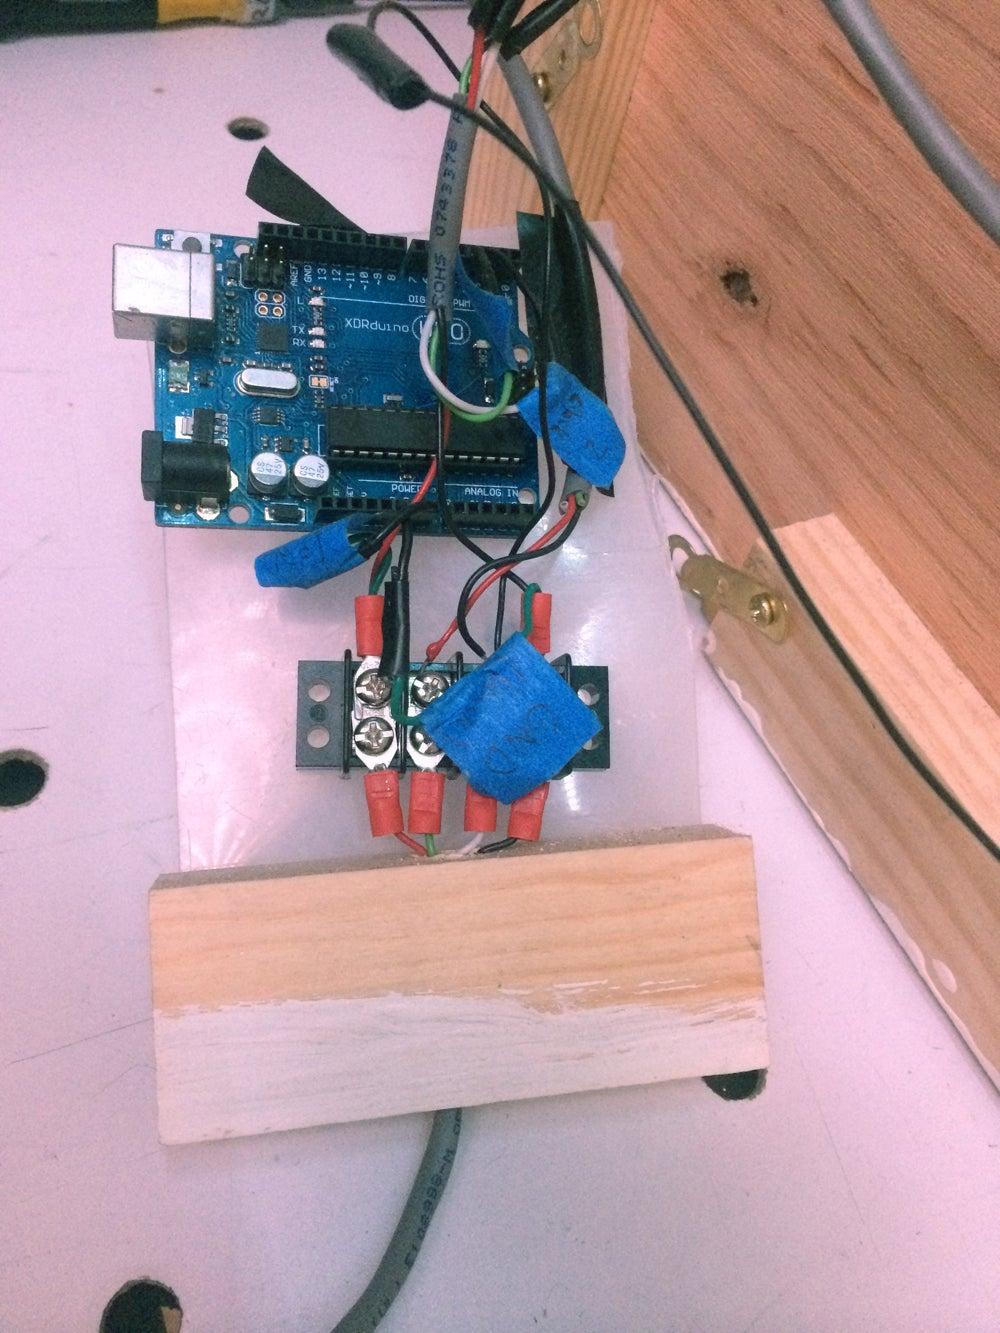 Adding the Arduino